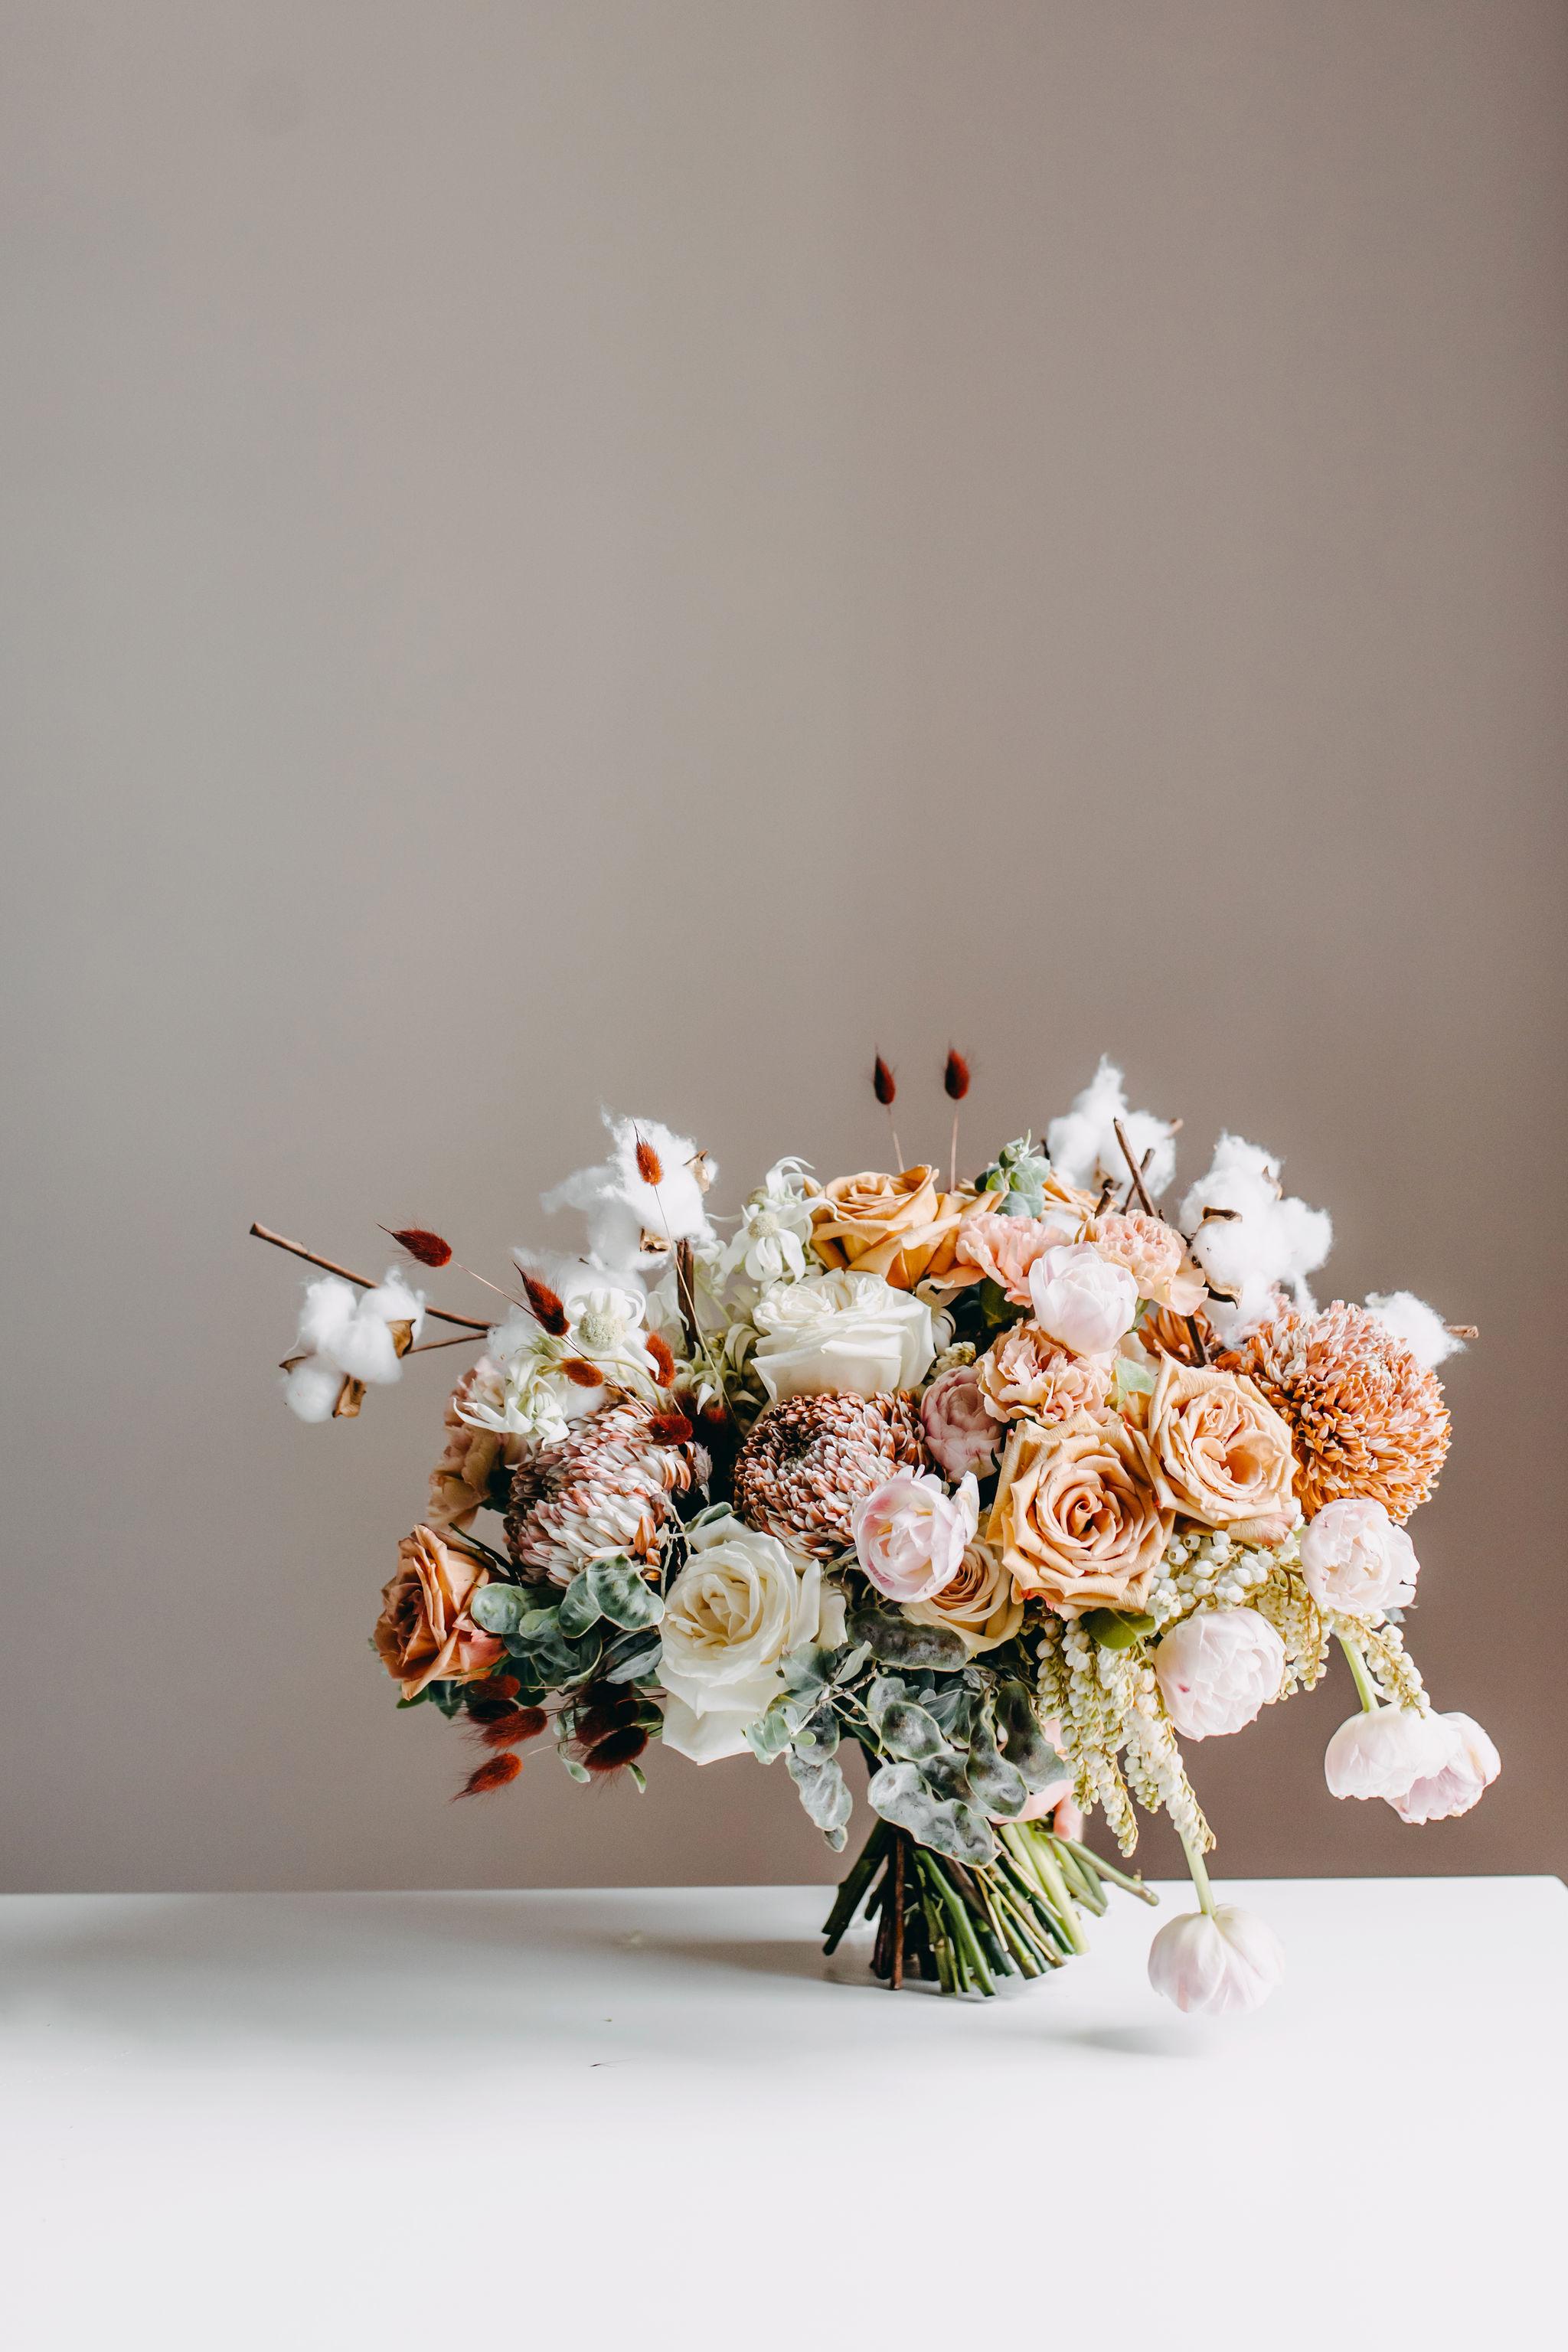 205-WEDDINGSTYLEDSHOOT-STATEBUILDINGS-28OCT2019